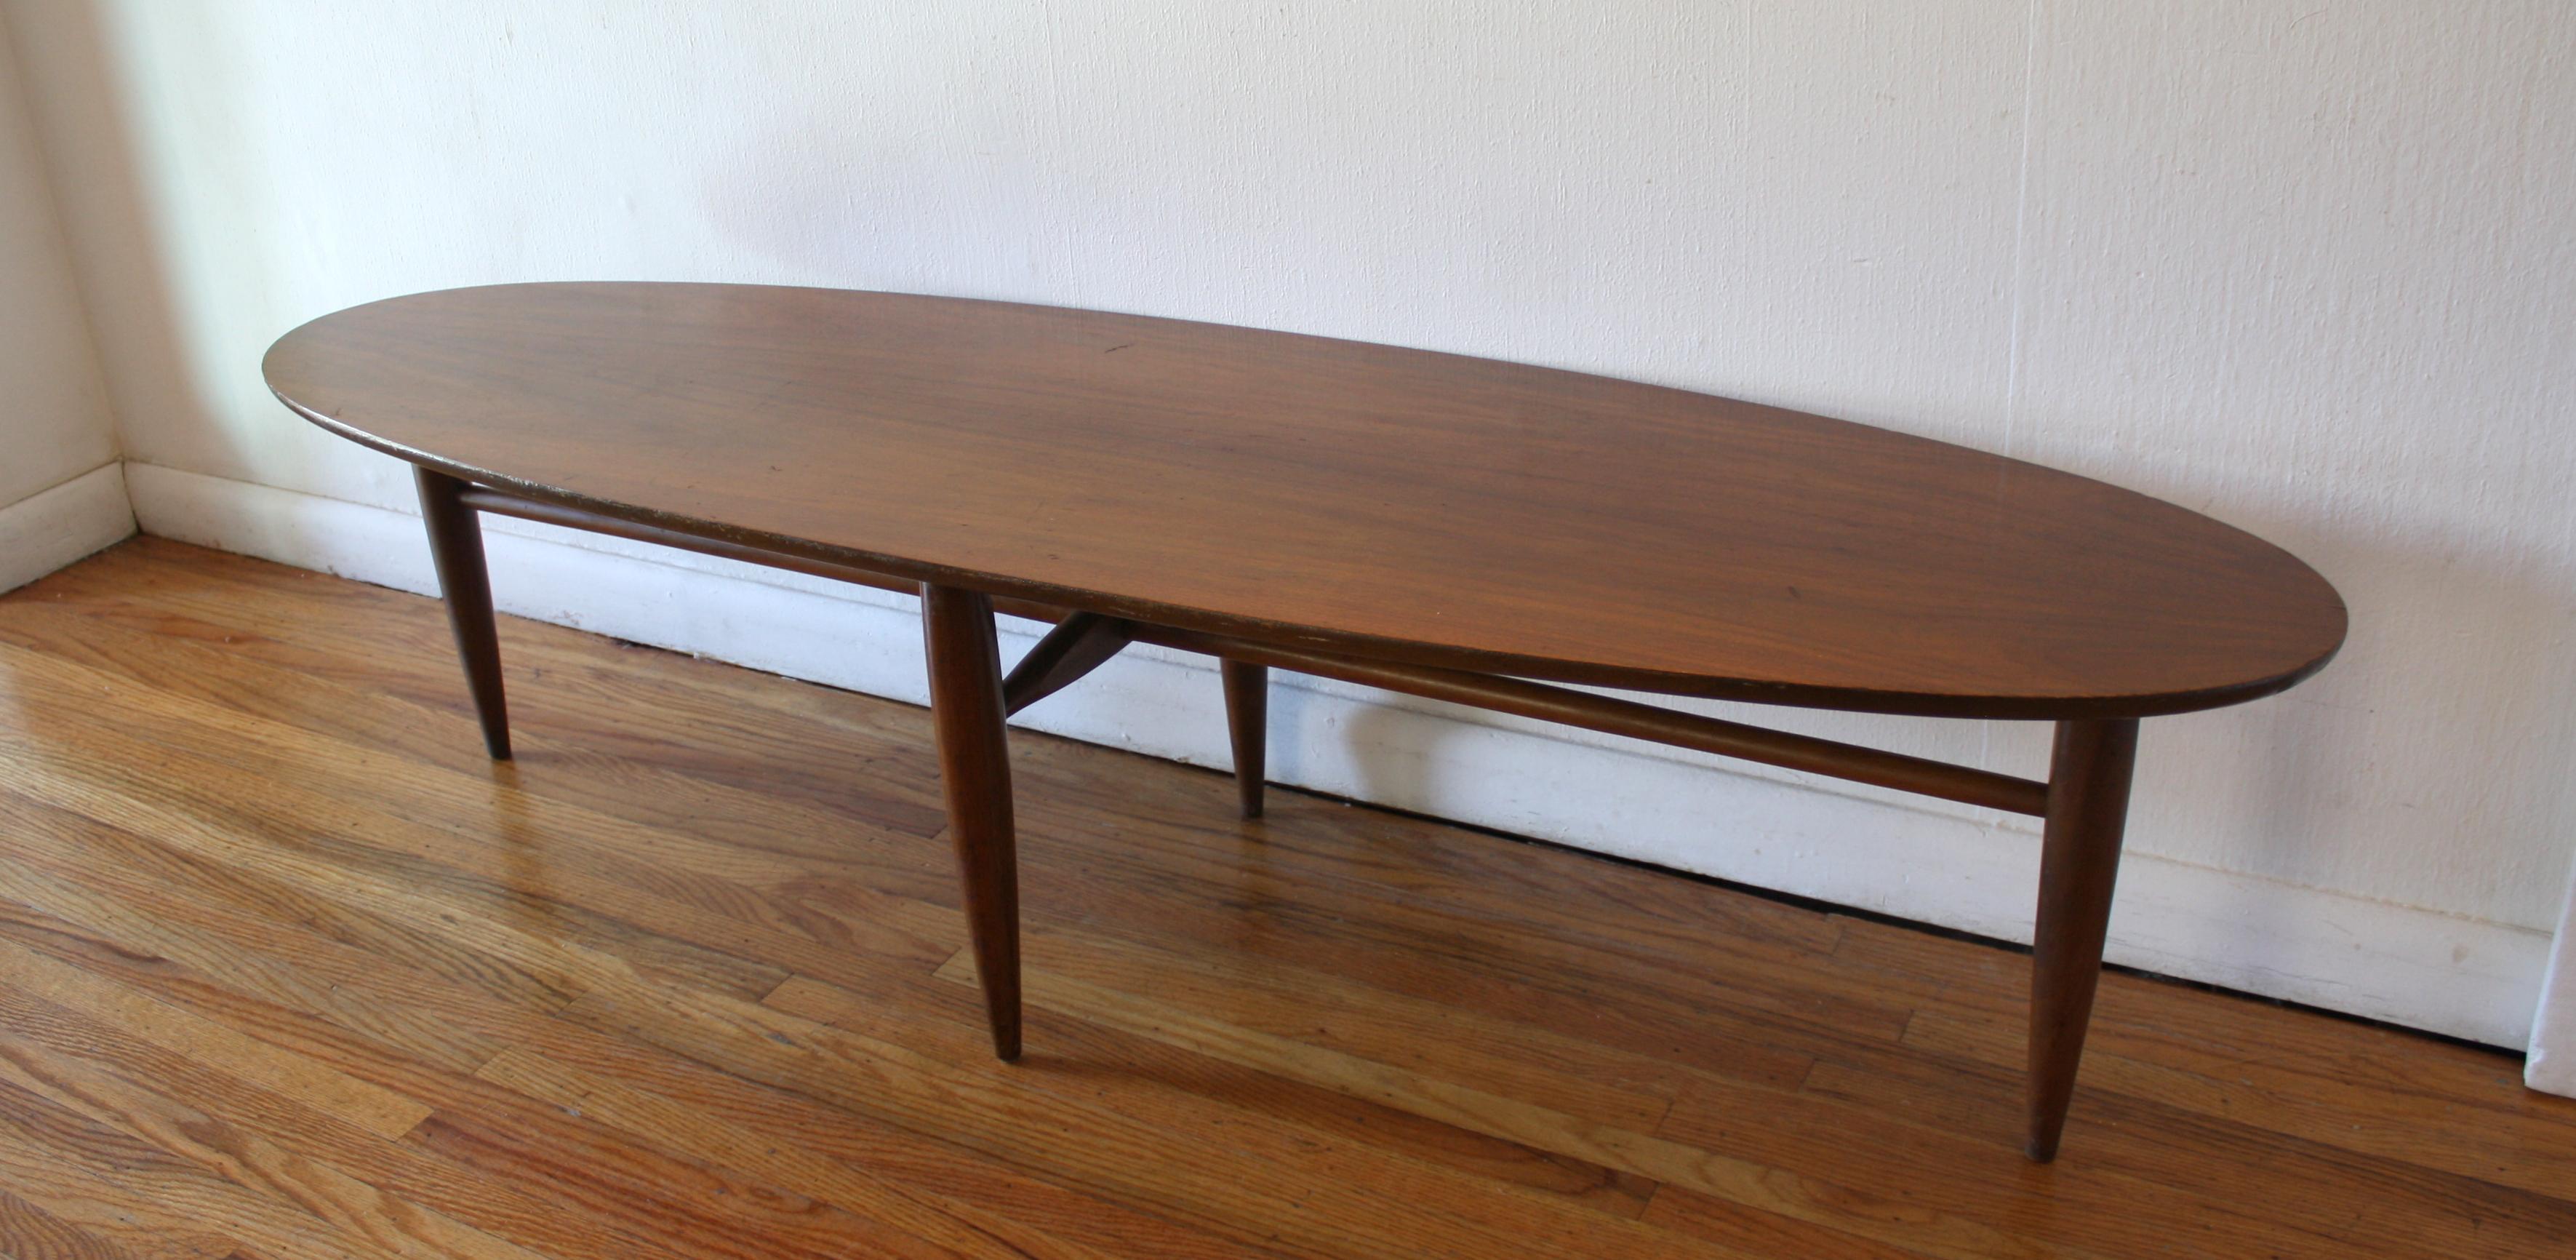 mcm surfboard coffee table 2